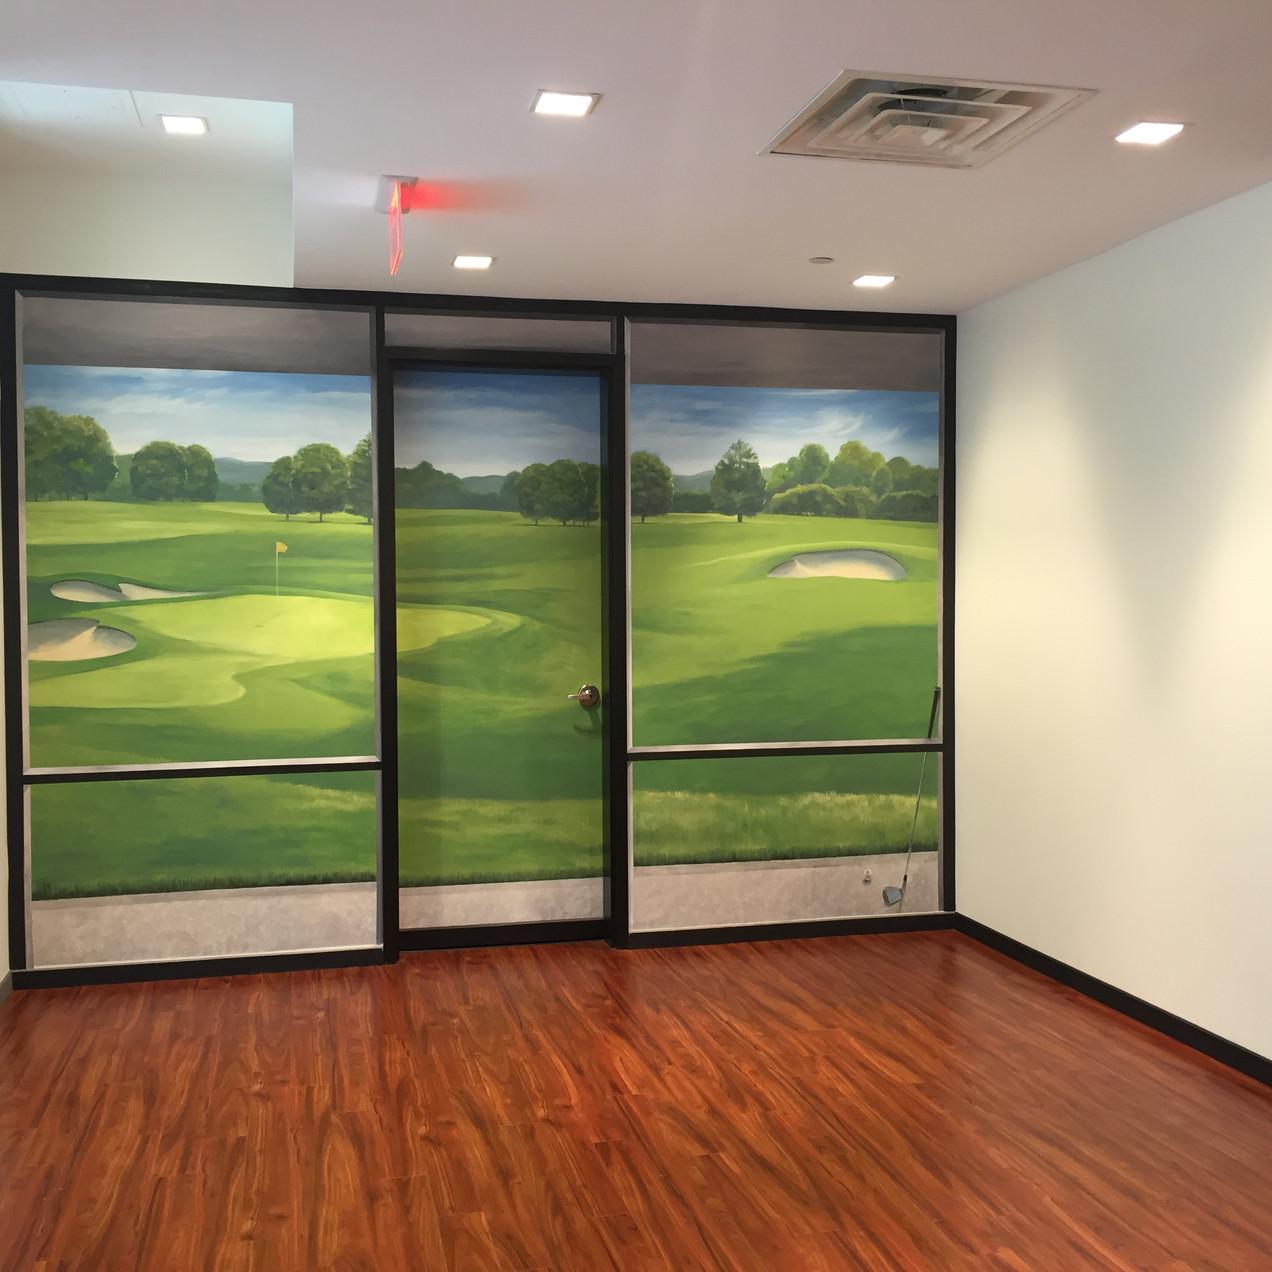 HP Mural Golf Simulator Room Entrance On